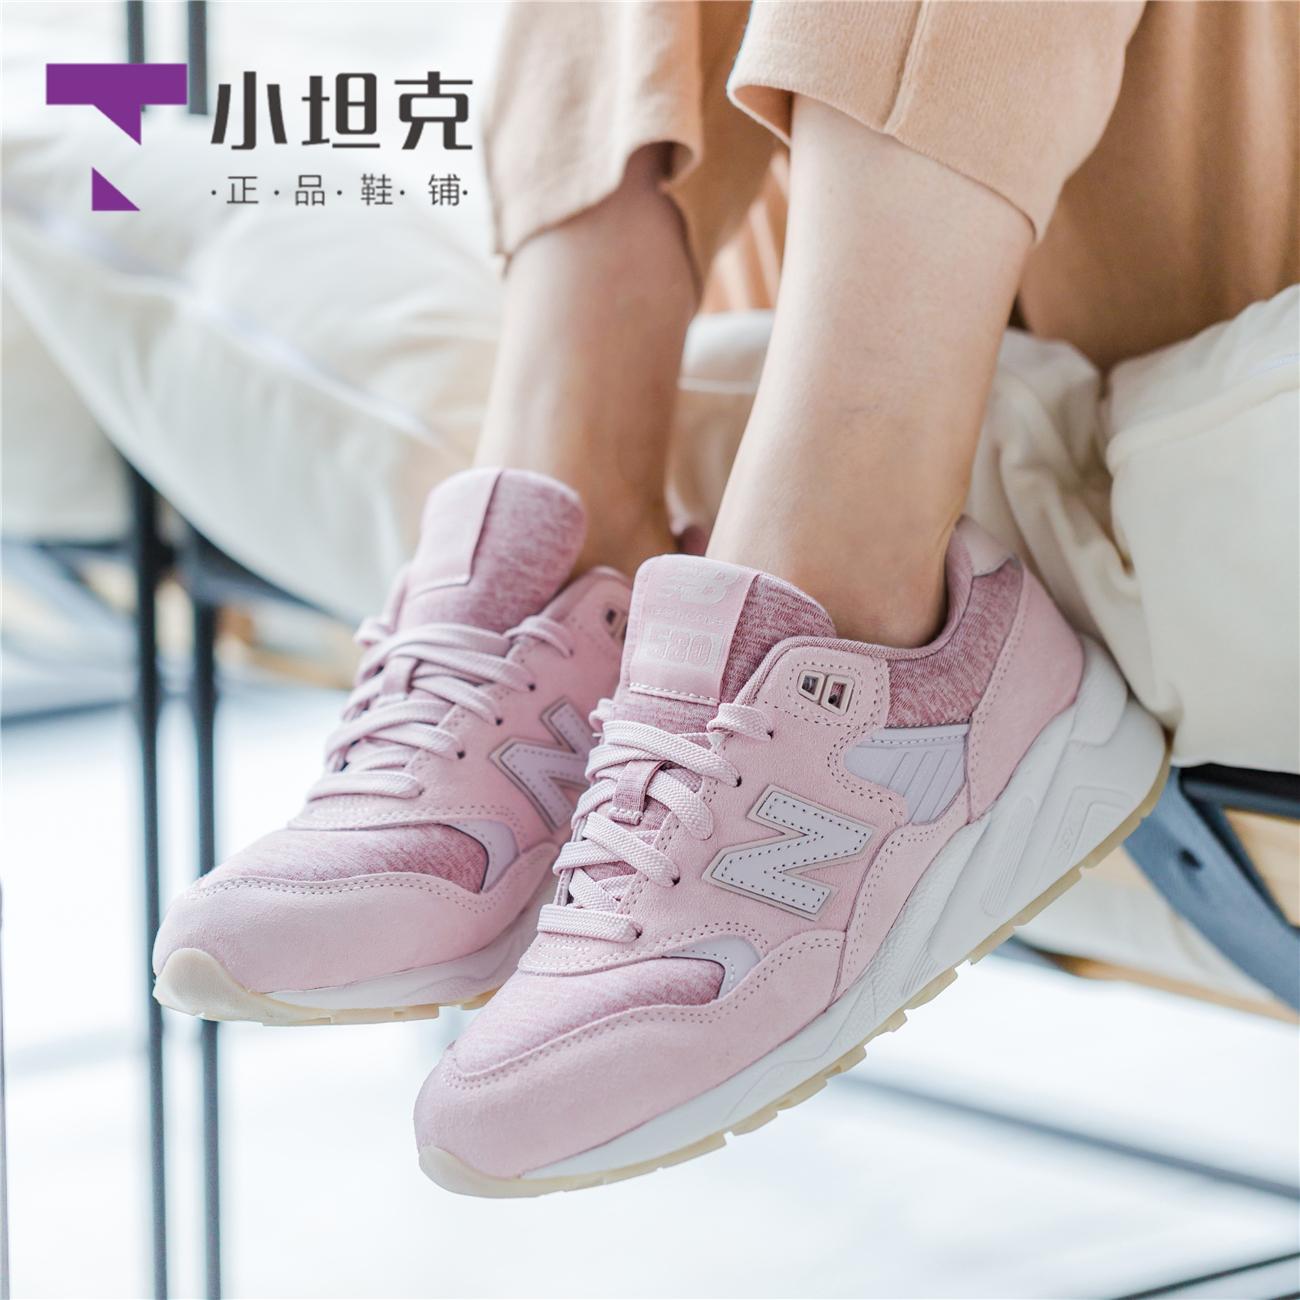 New Balance/NB女鞋少女粉运动鞋跑步鞋复古鞋休闲鞋WRT580HP/HB